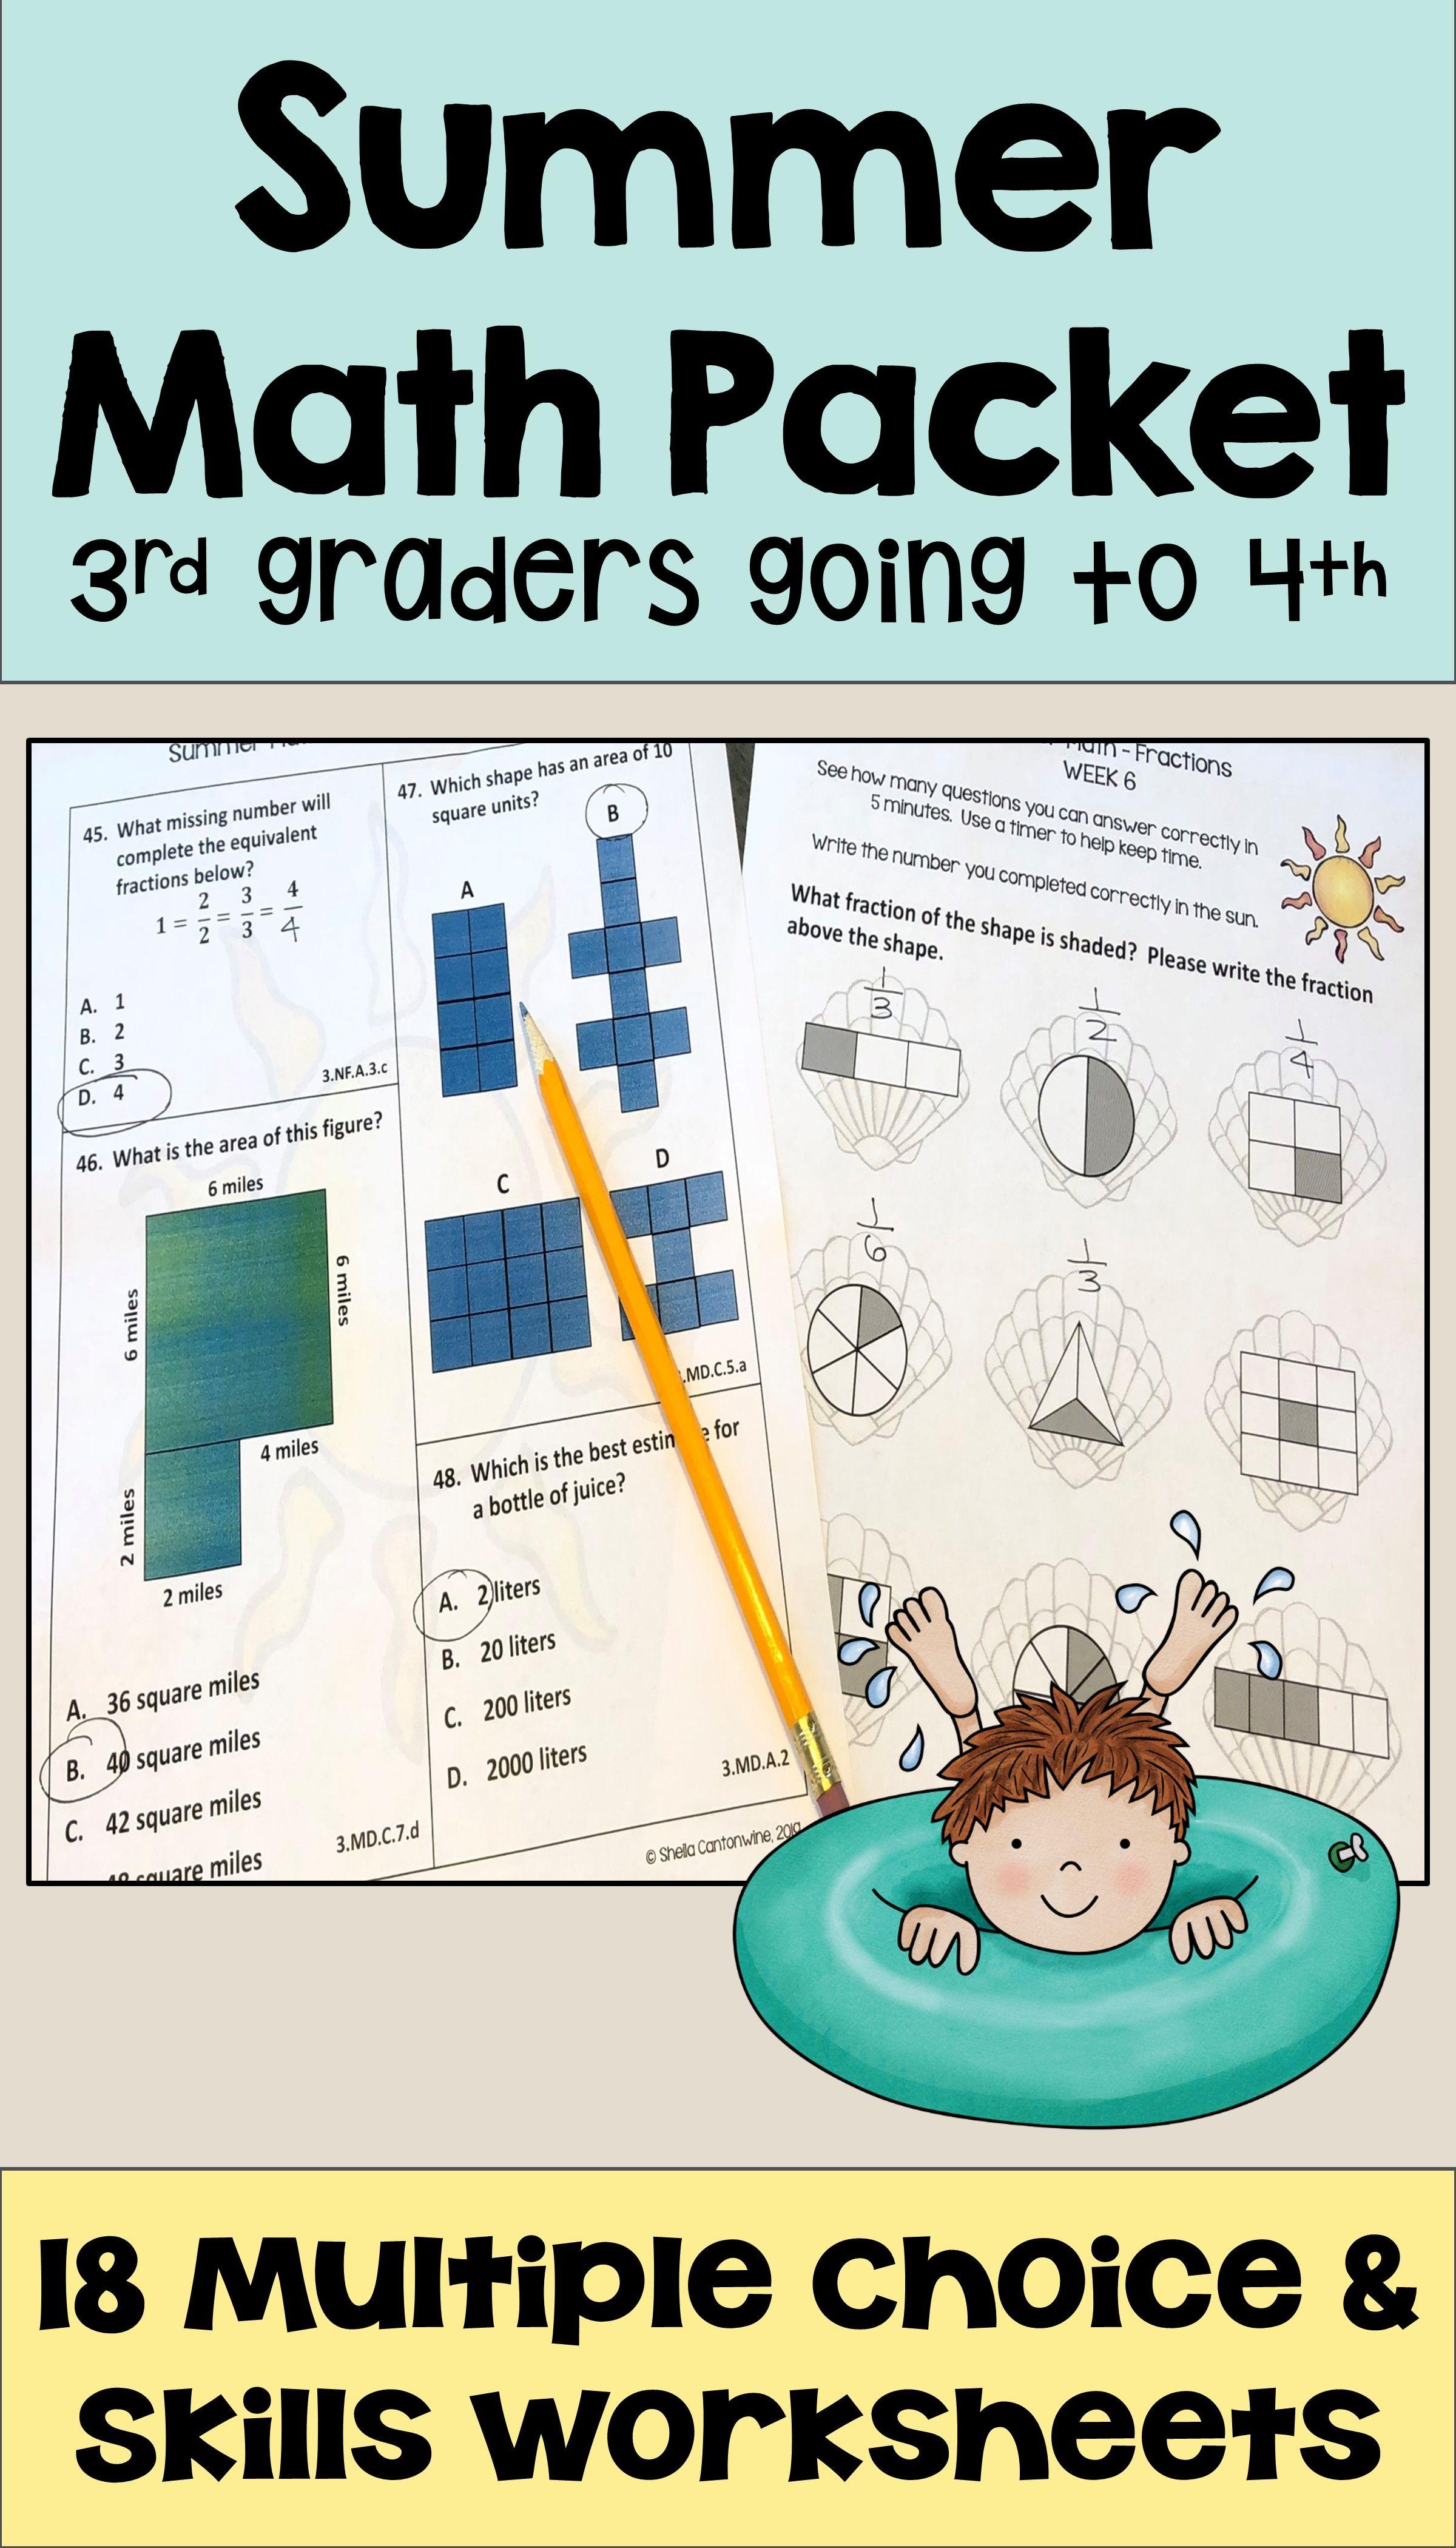 medium resolution of Summer Math Packet for Rising 4th Graders - Review of 3rd Grade Math    Summer math